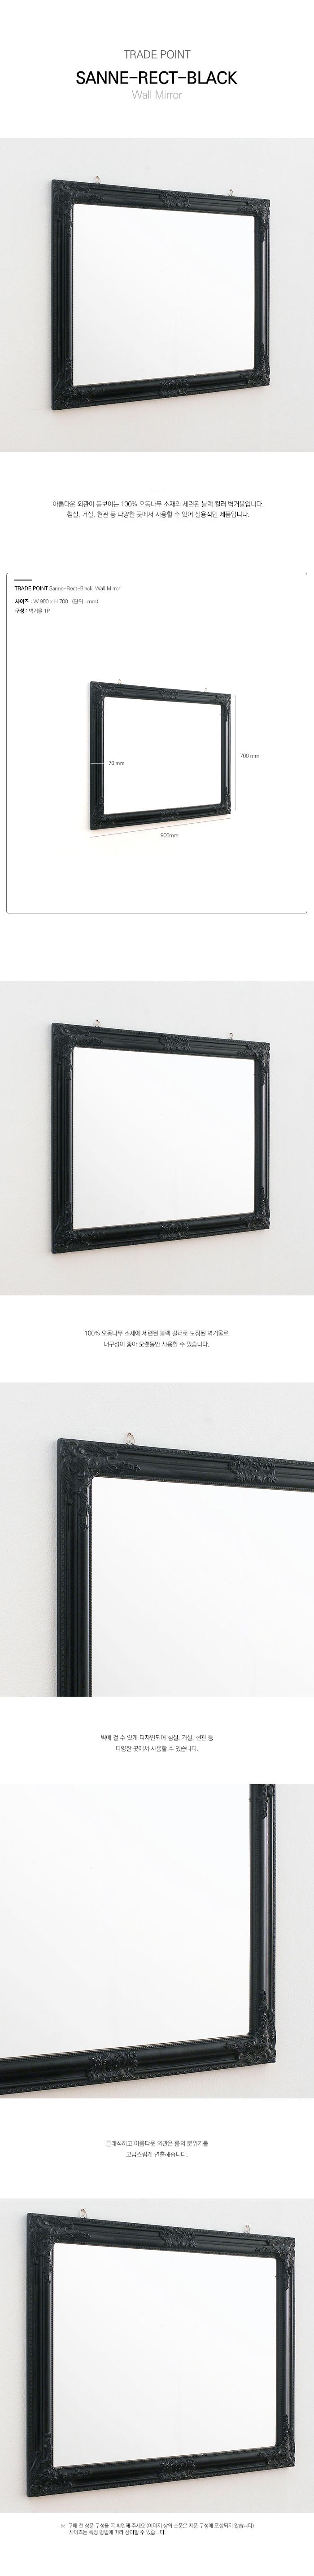 Sanne-Rect-Black.jpg